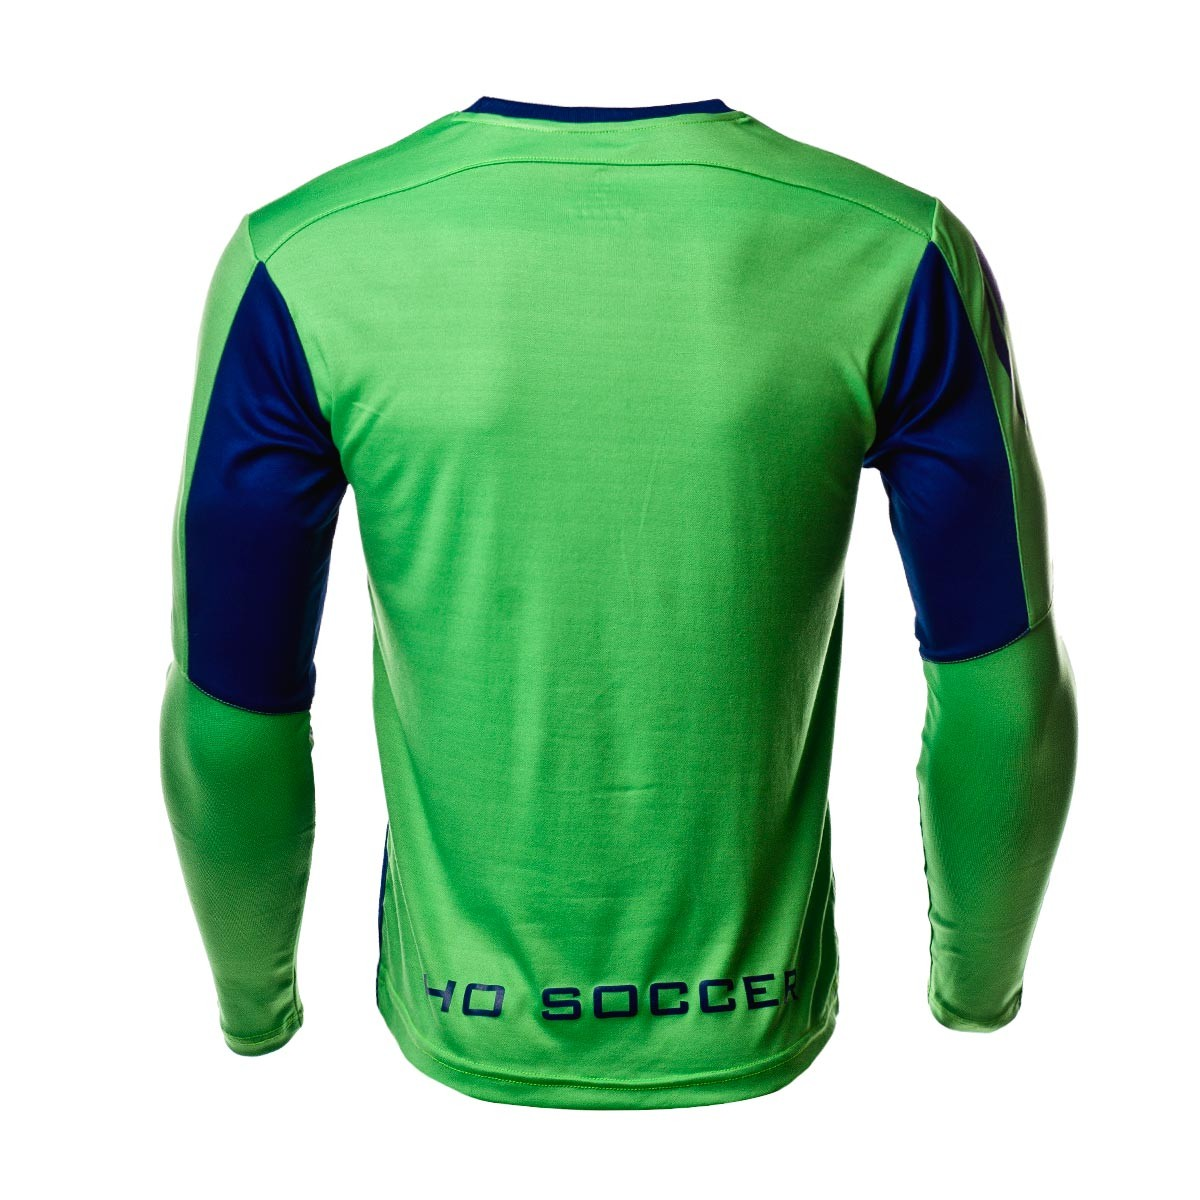 fe1814665089d Jersey HO Soccer Ikarus 2018 Green-Blue - Football store Fútbol Emotion